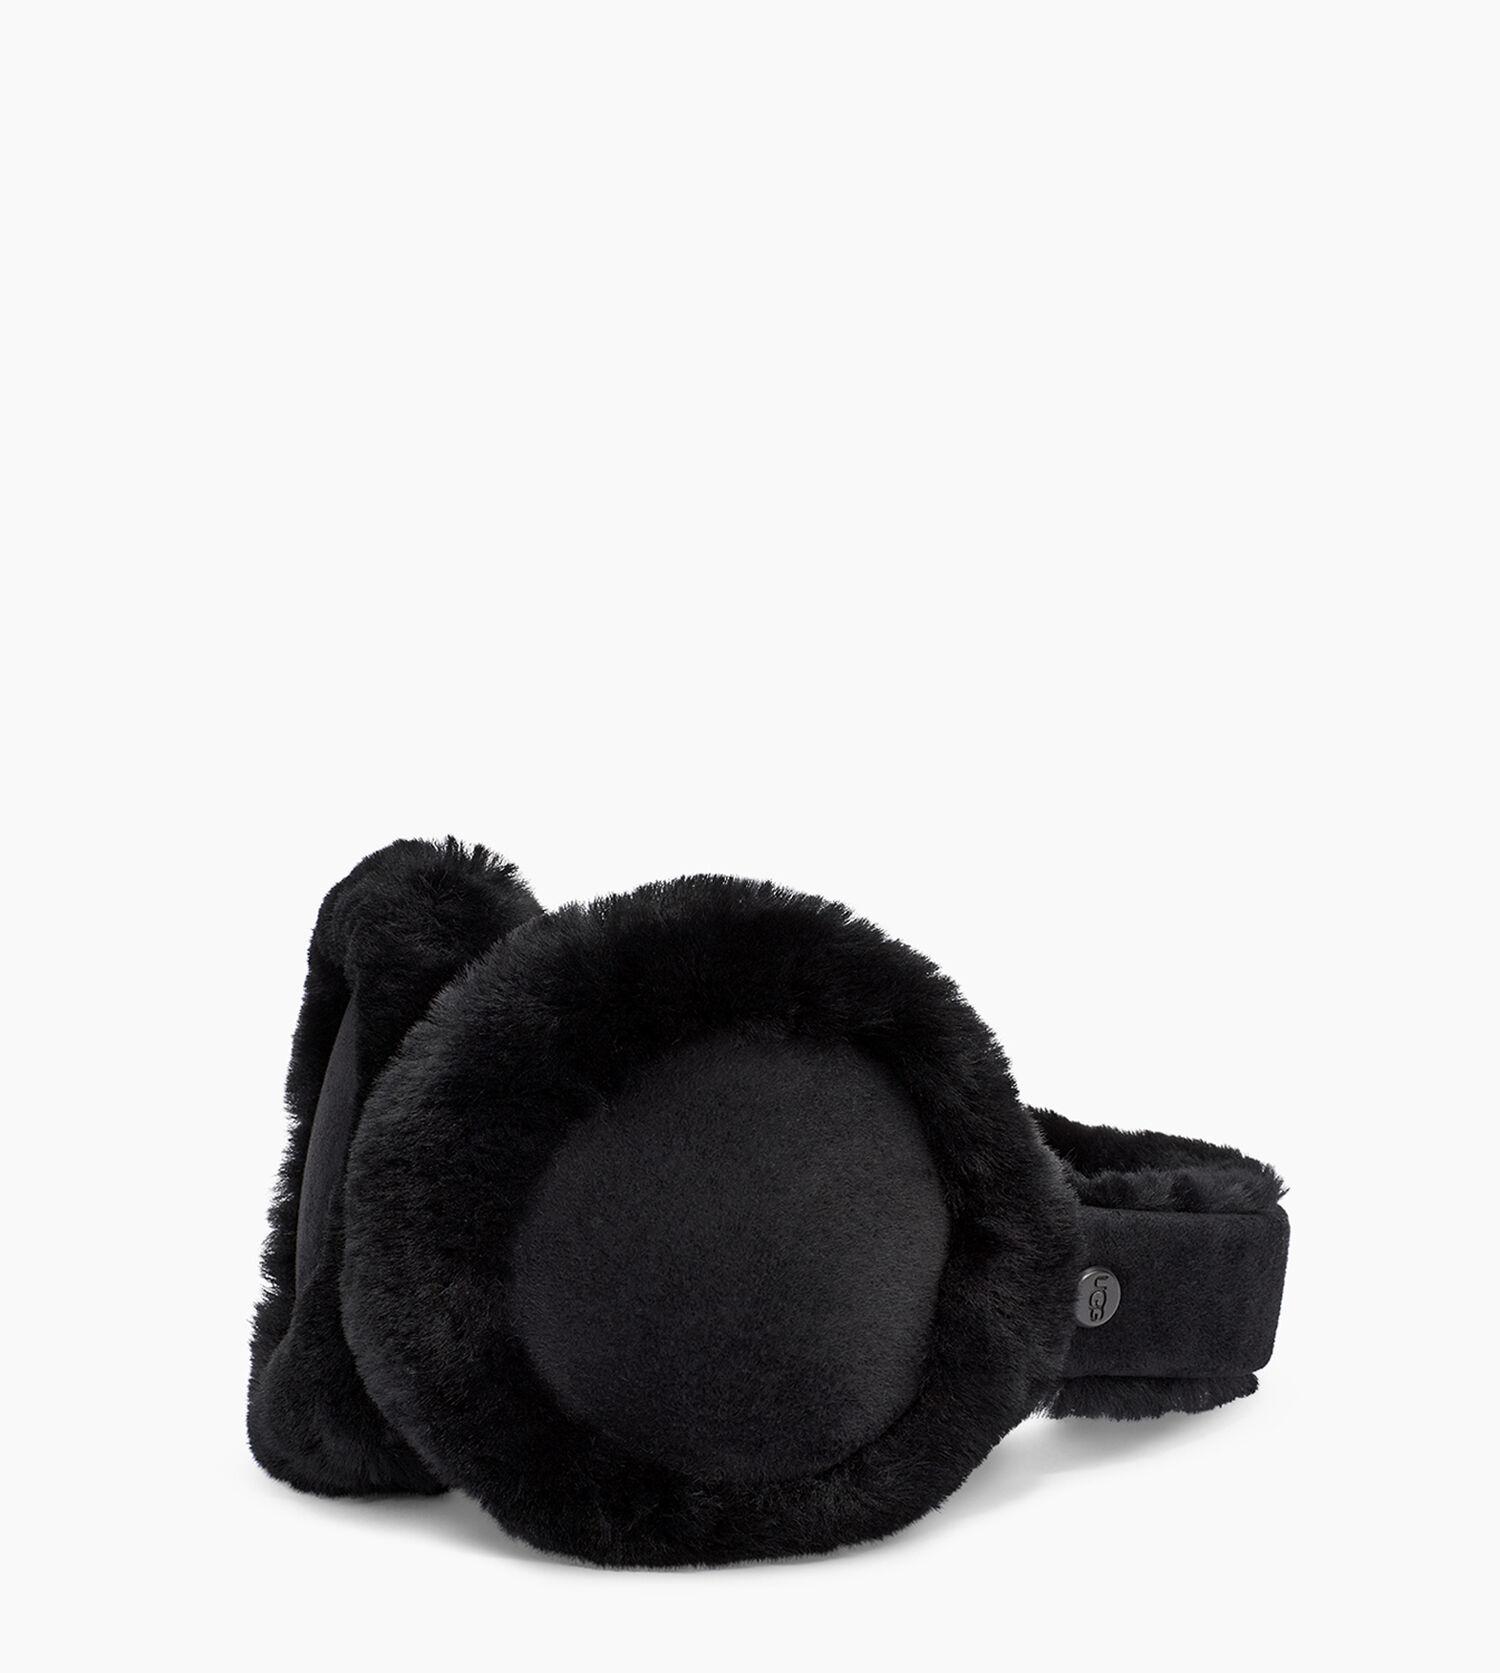 88396b722dc Women's Share this product Sheepskin Bluetooth Earmuff